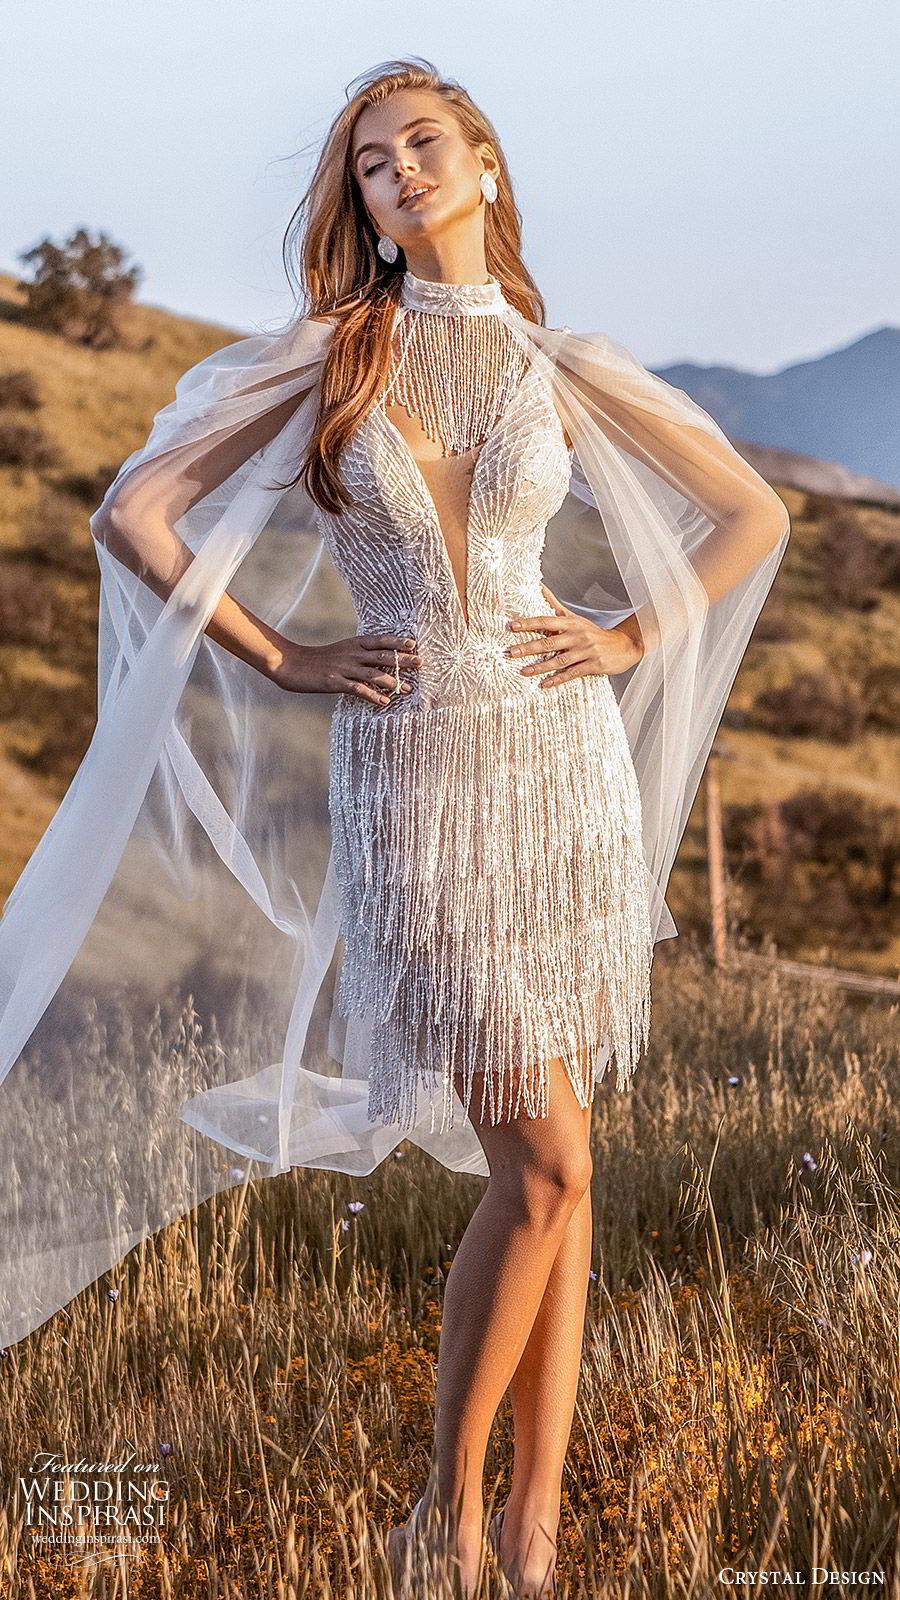 crystal design 2020 couture bridal sleeveless plunging v neckline fully embellished beaded fringe short wedding dress (9) glam high neck sheer cape mv